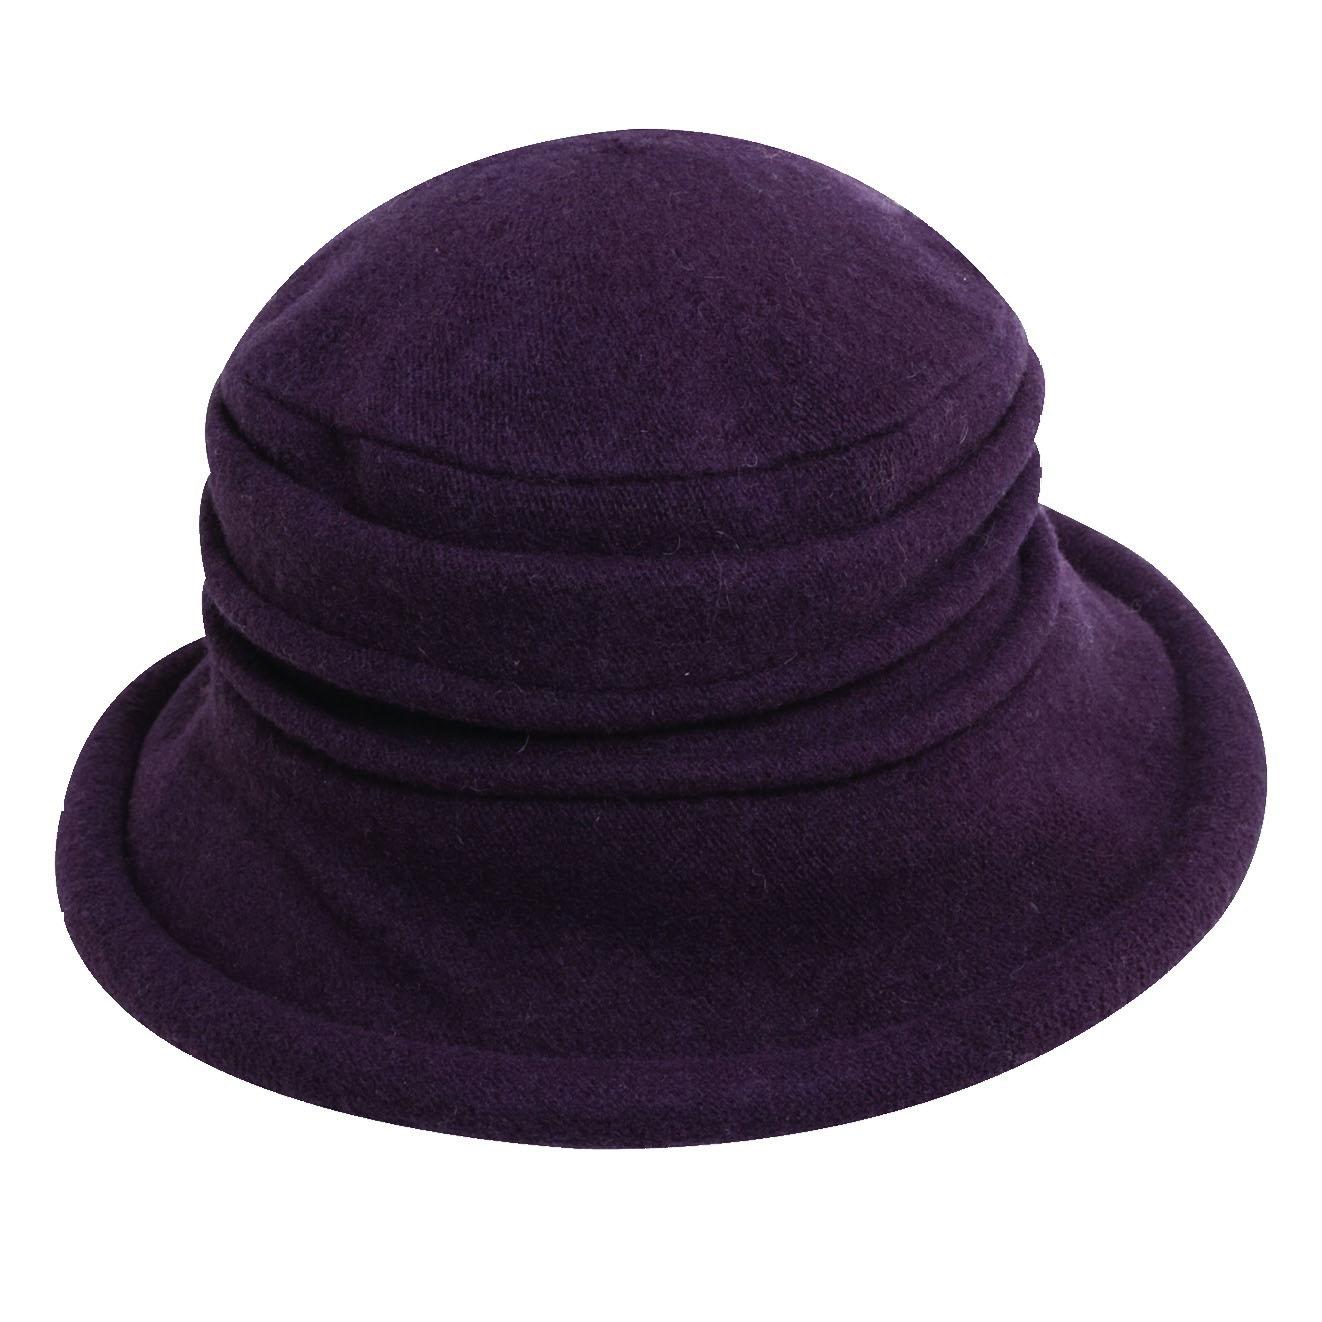 Boiled Wool Soft Cloche Hat Plum 22571014e8a